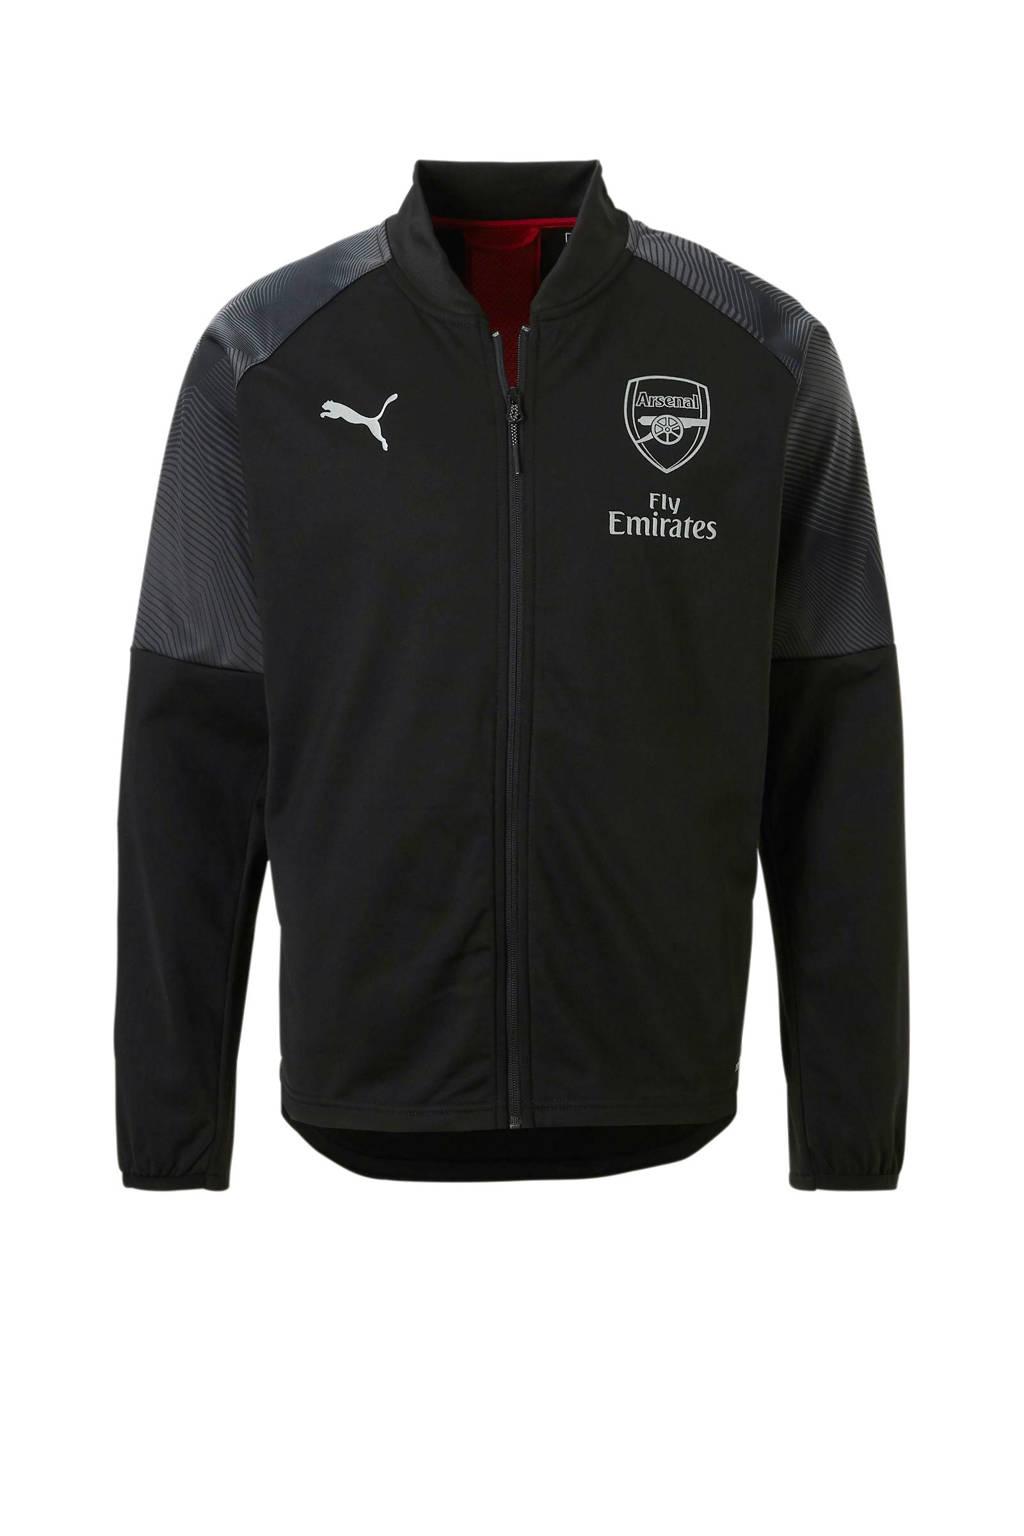 Puma Senior Arsenal FC voetbaljack, Zwart/grijs